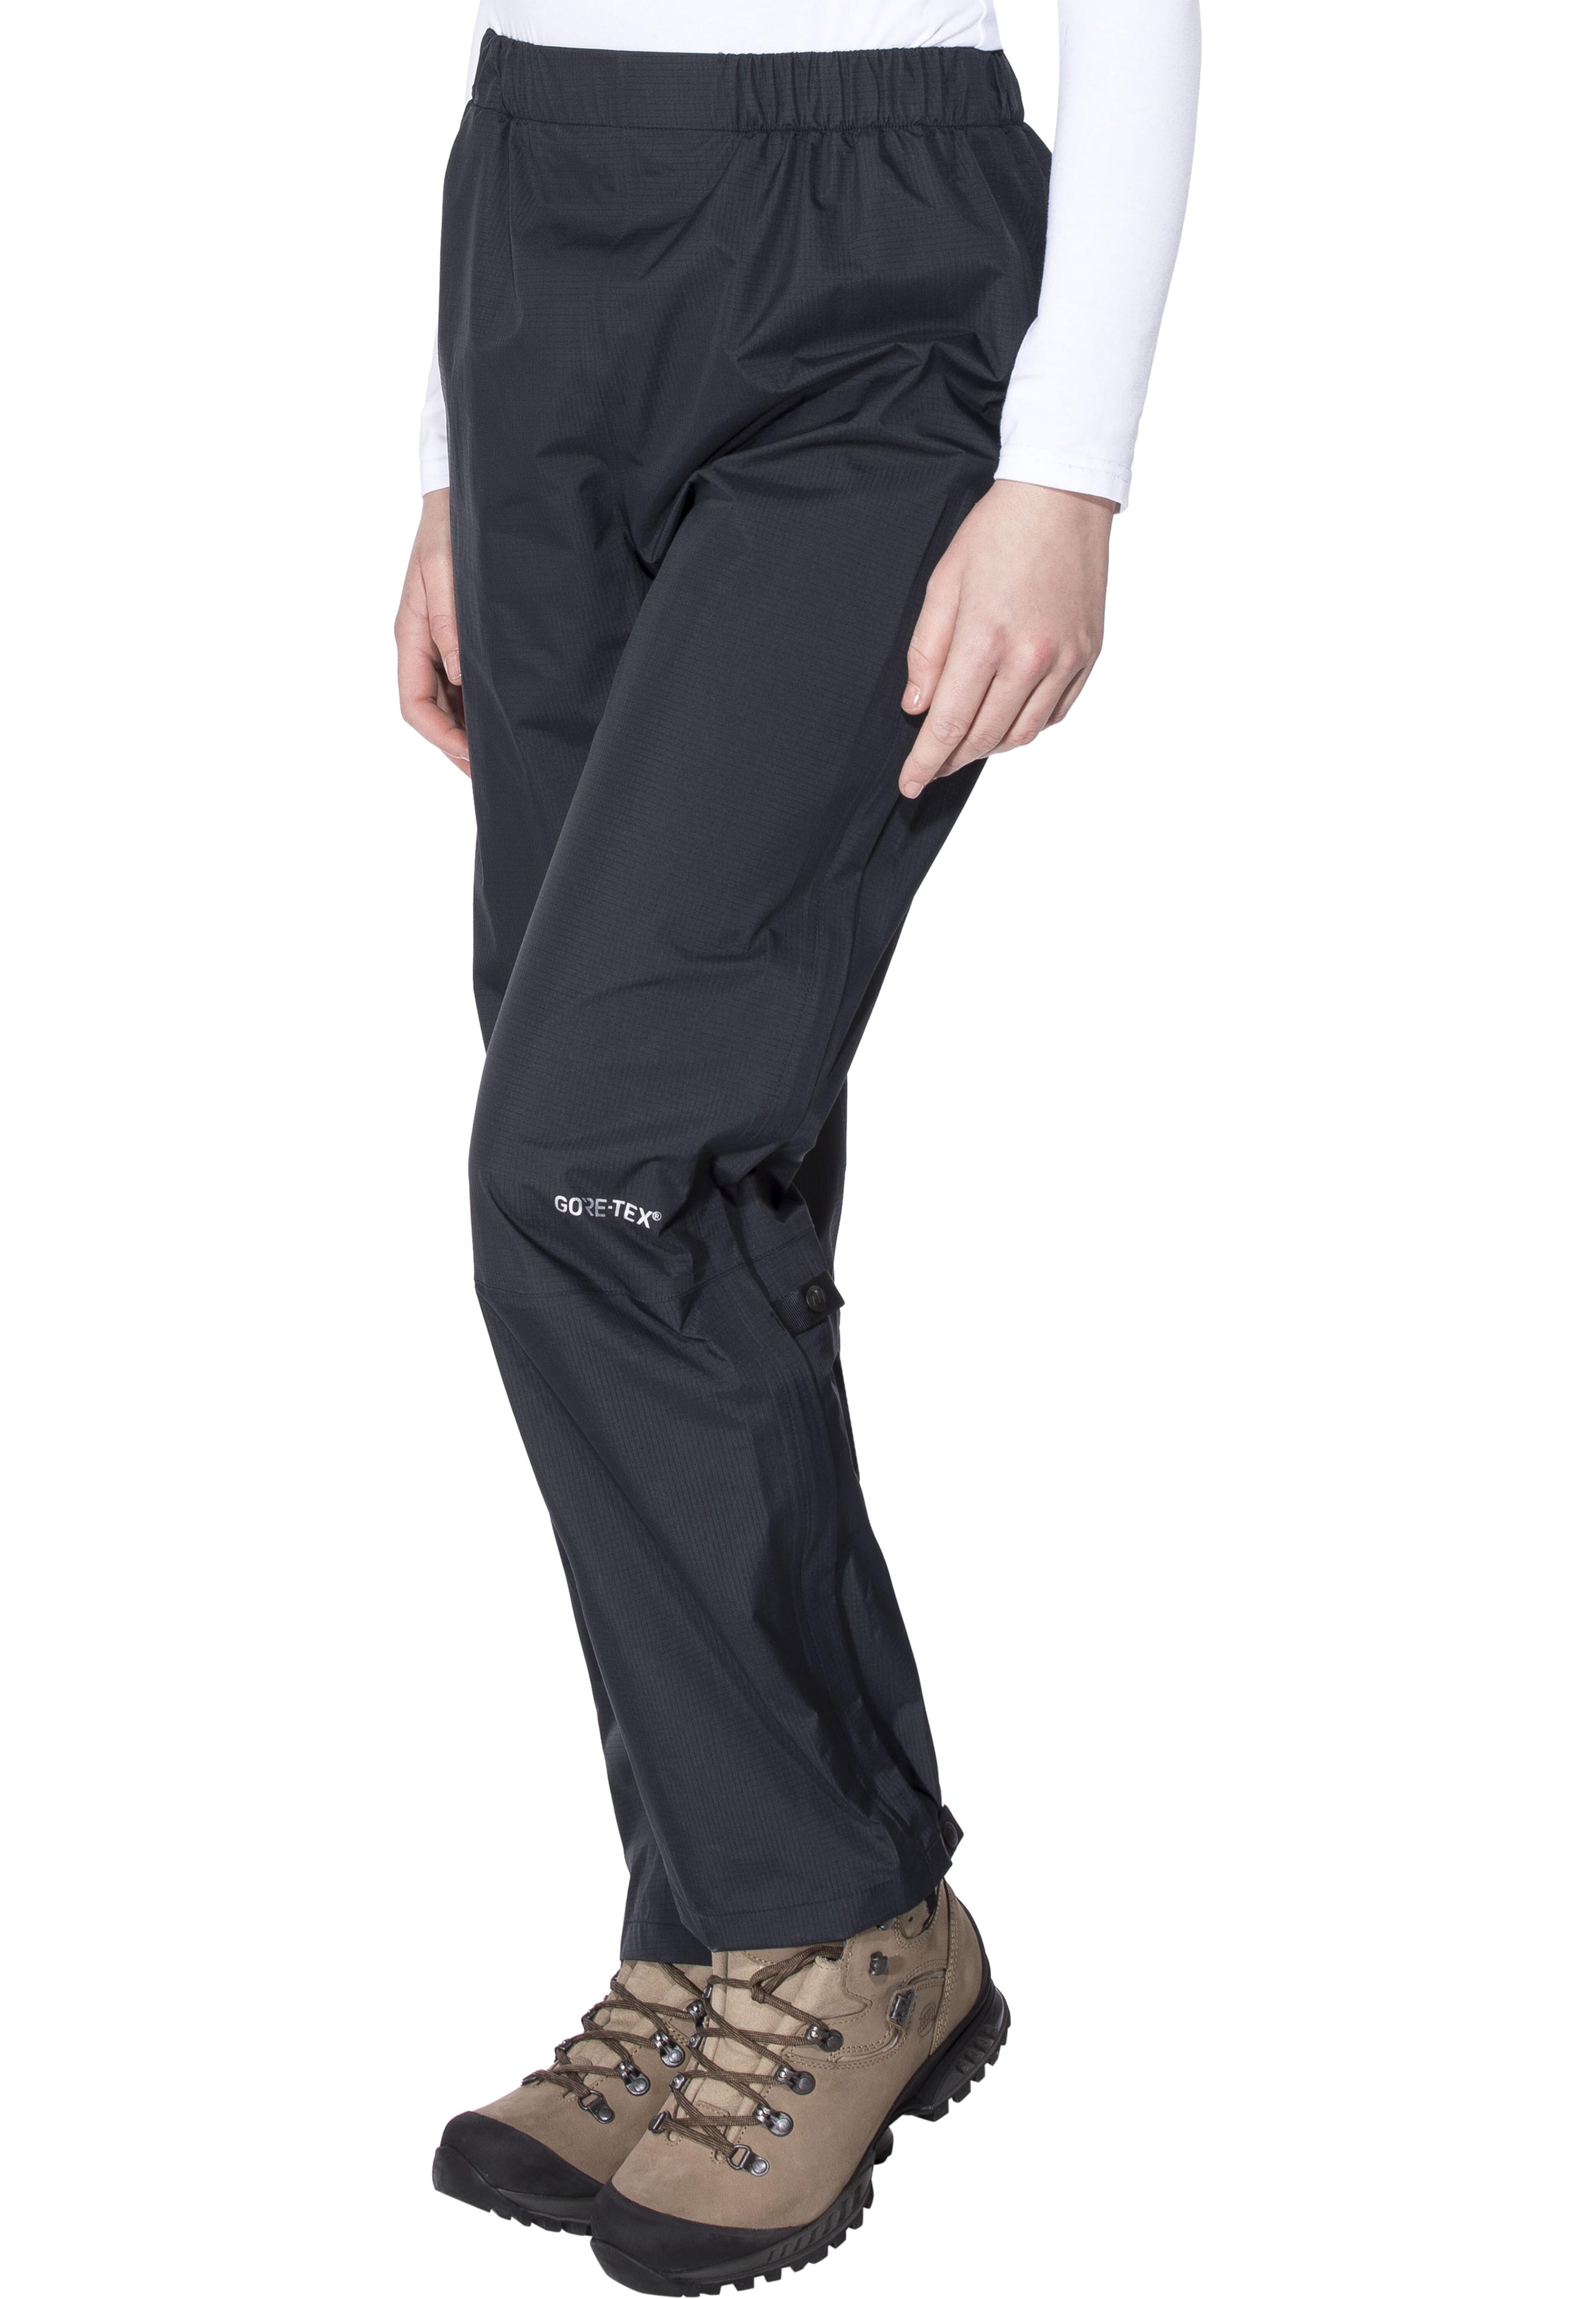 Berghaus Jackets, Fleeces, Pullovers & Trousers | Berghaus